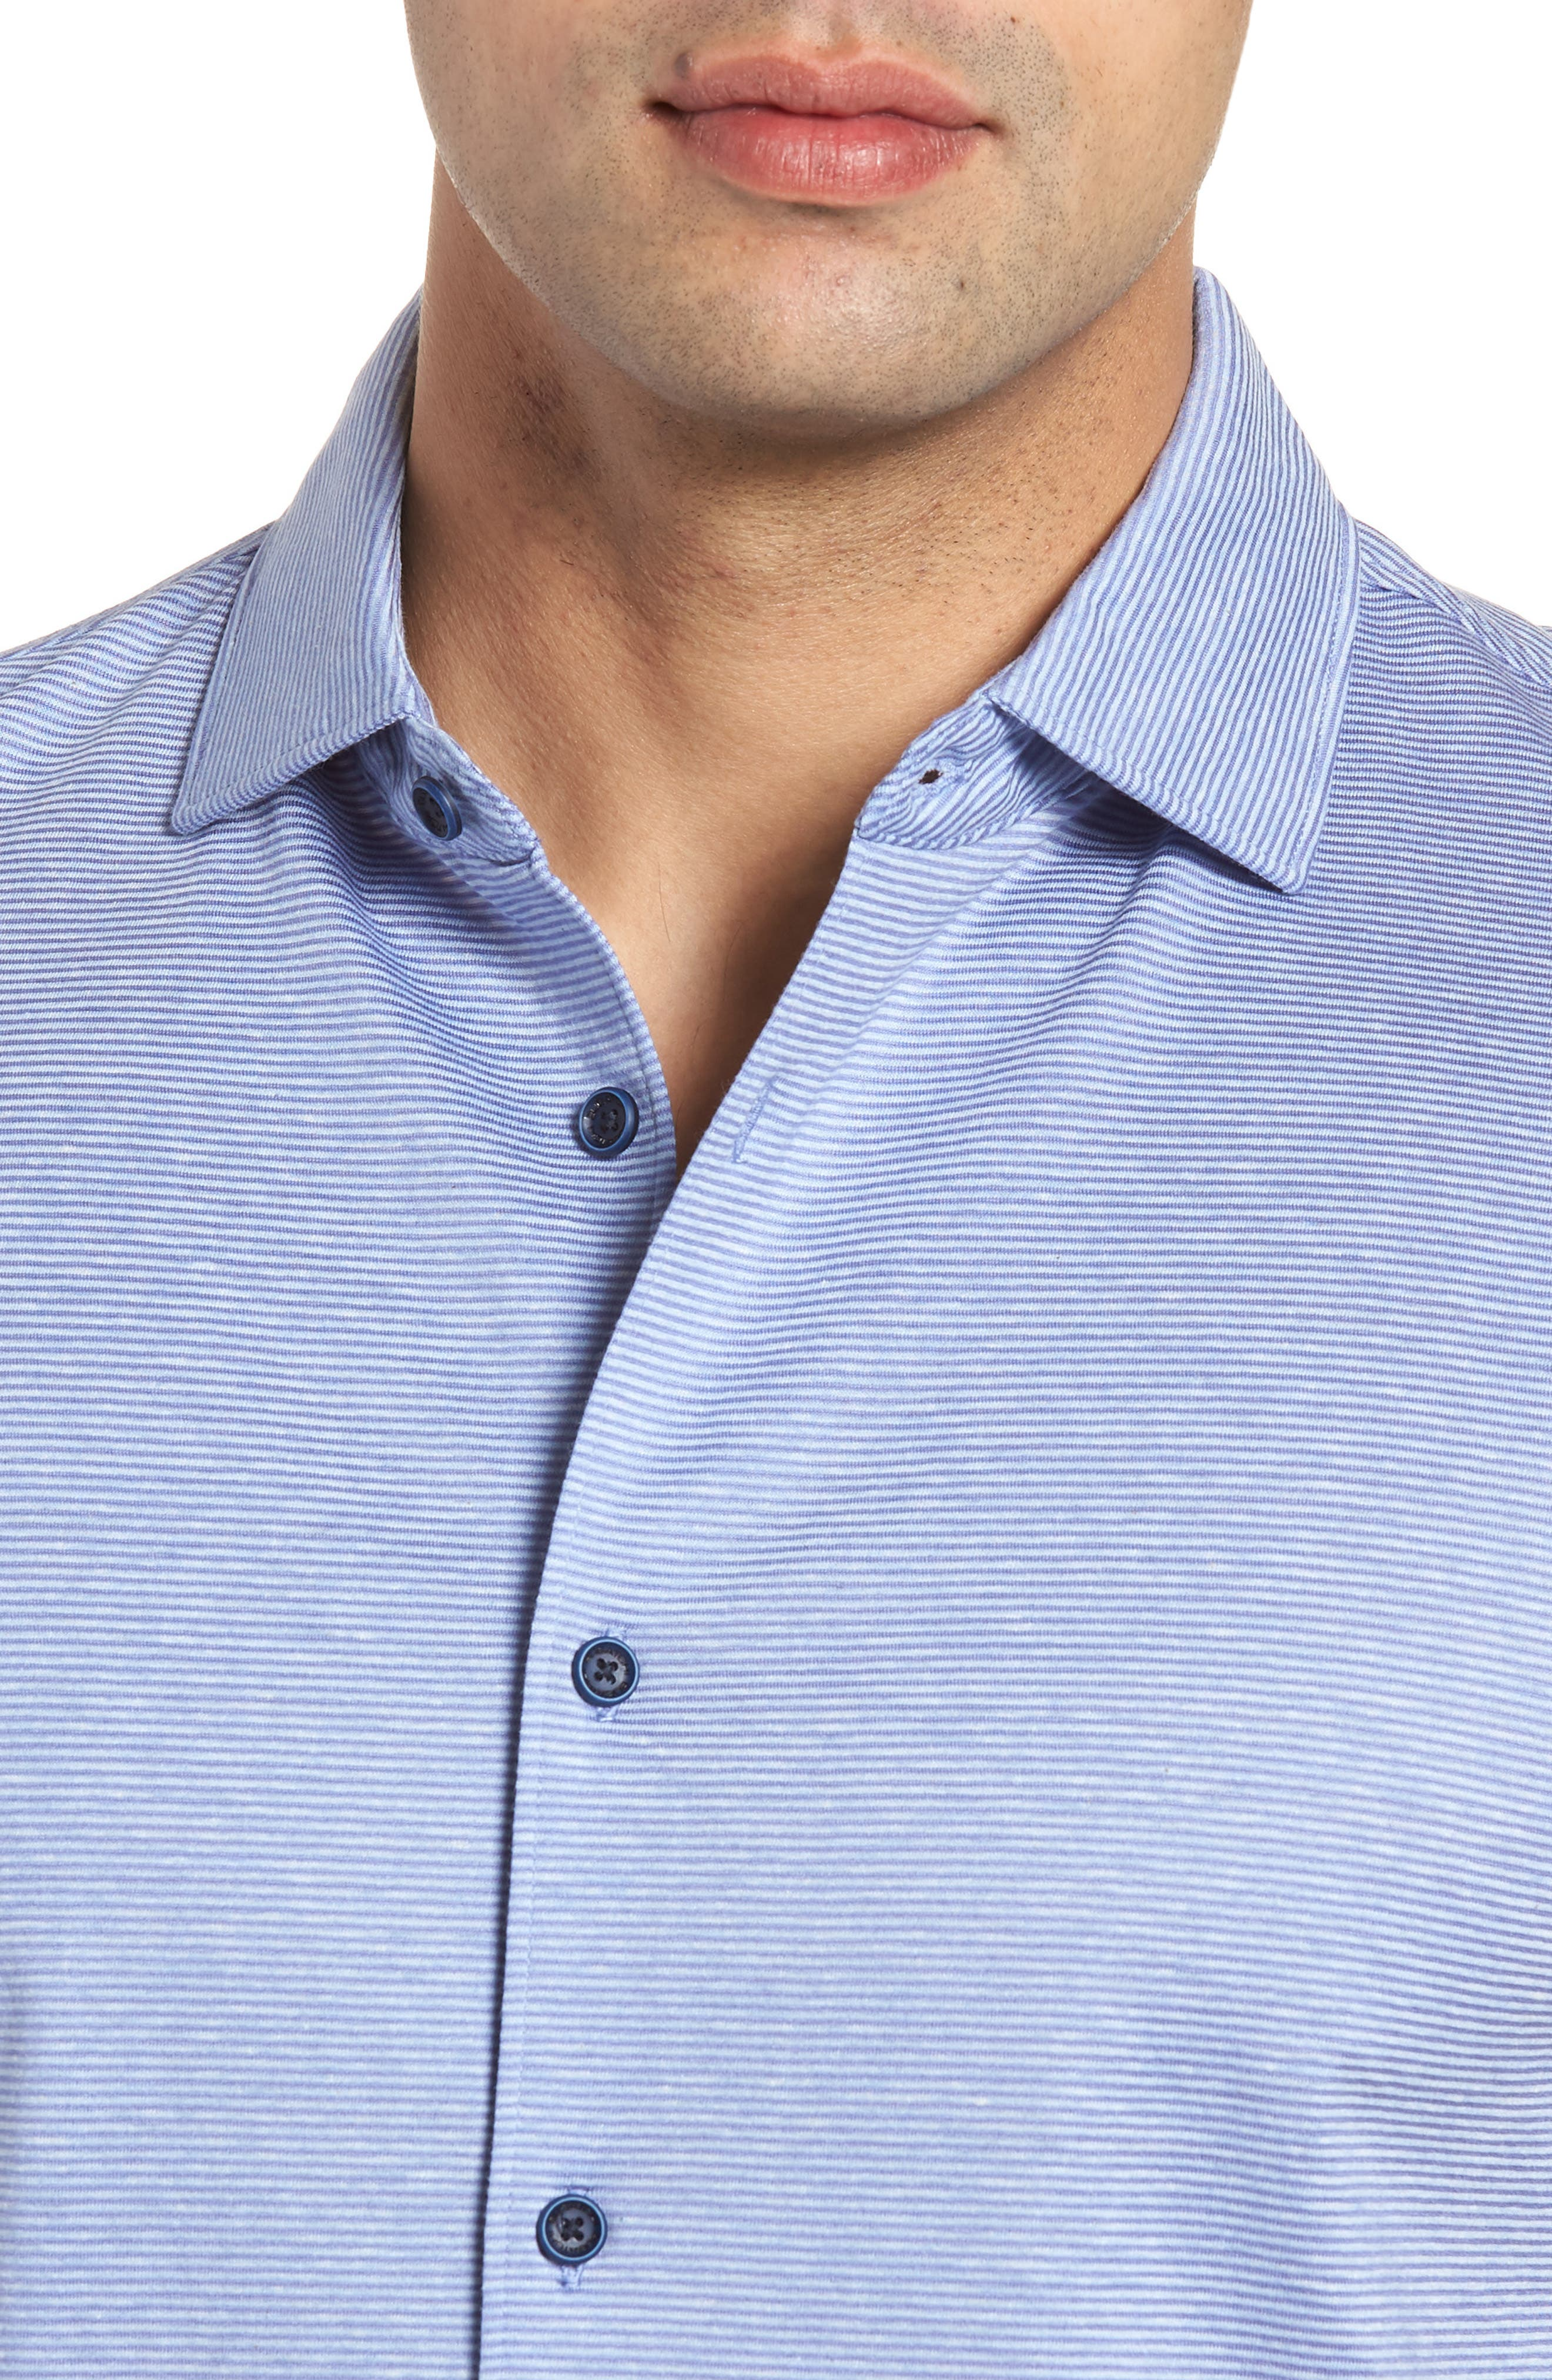 Regular Fit Knit Sport Shirt,                             Alternate thumbnail 4, color,                             Lilac